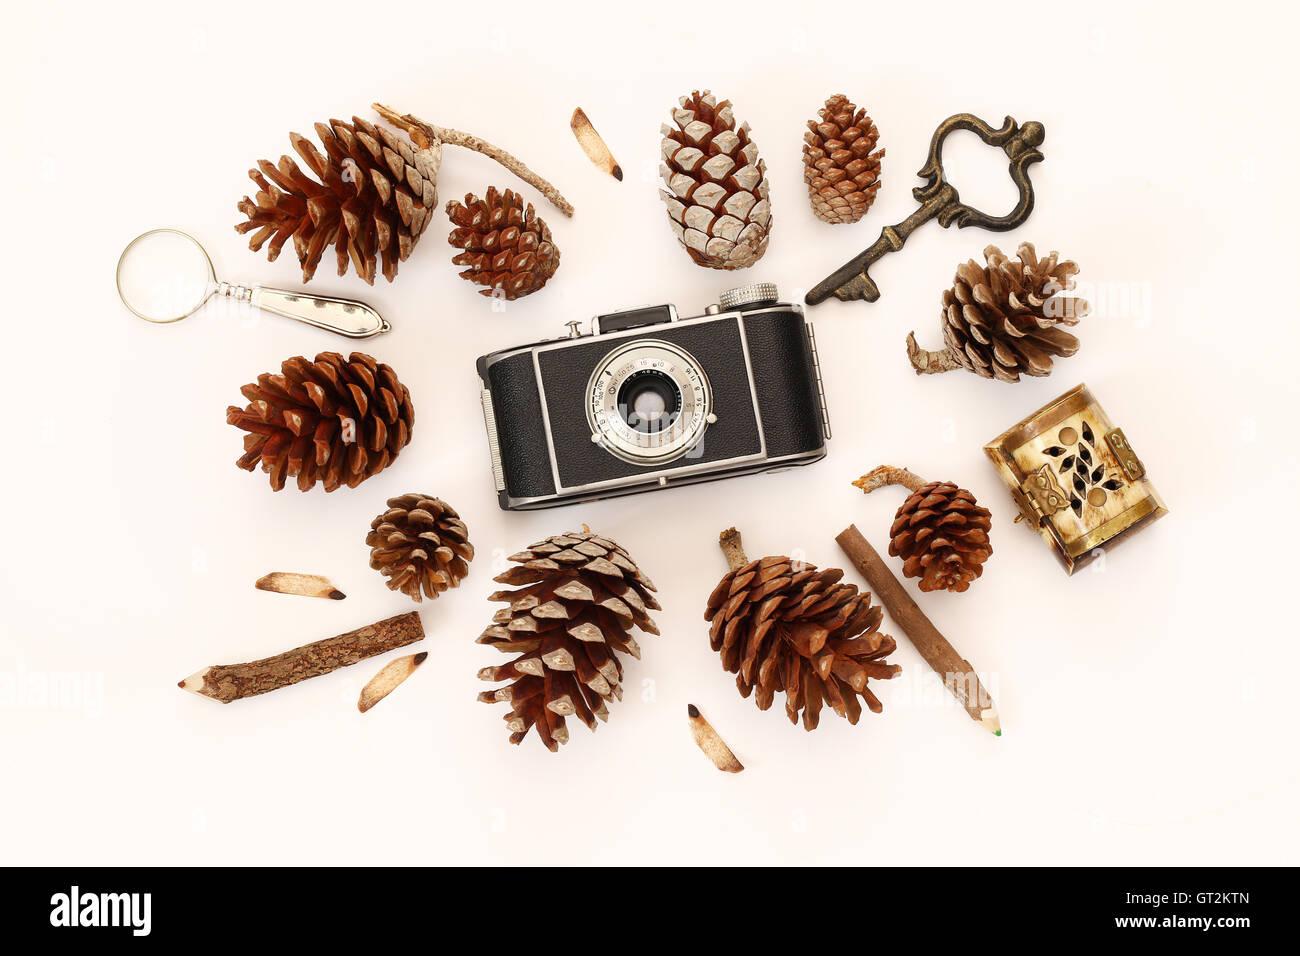 Cones Lens Stockfotos & Cones Lens Bilder - Alamy